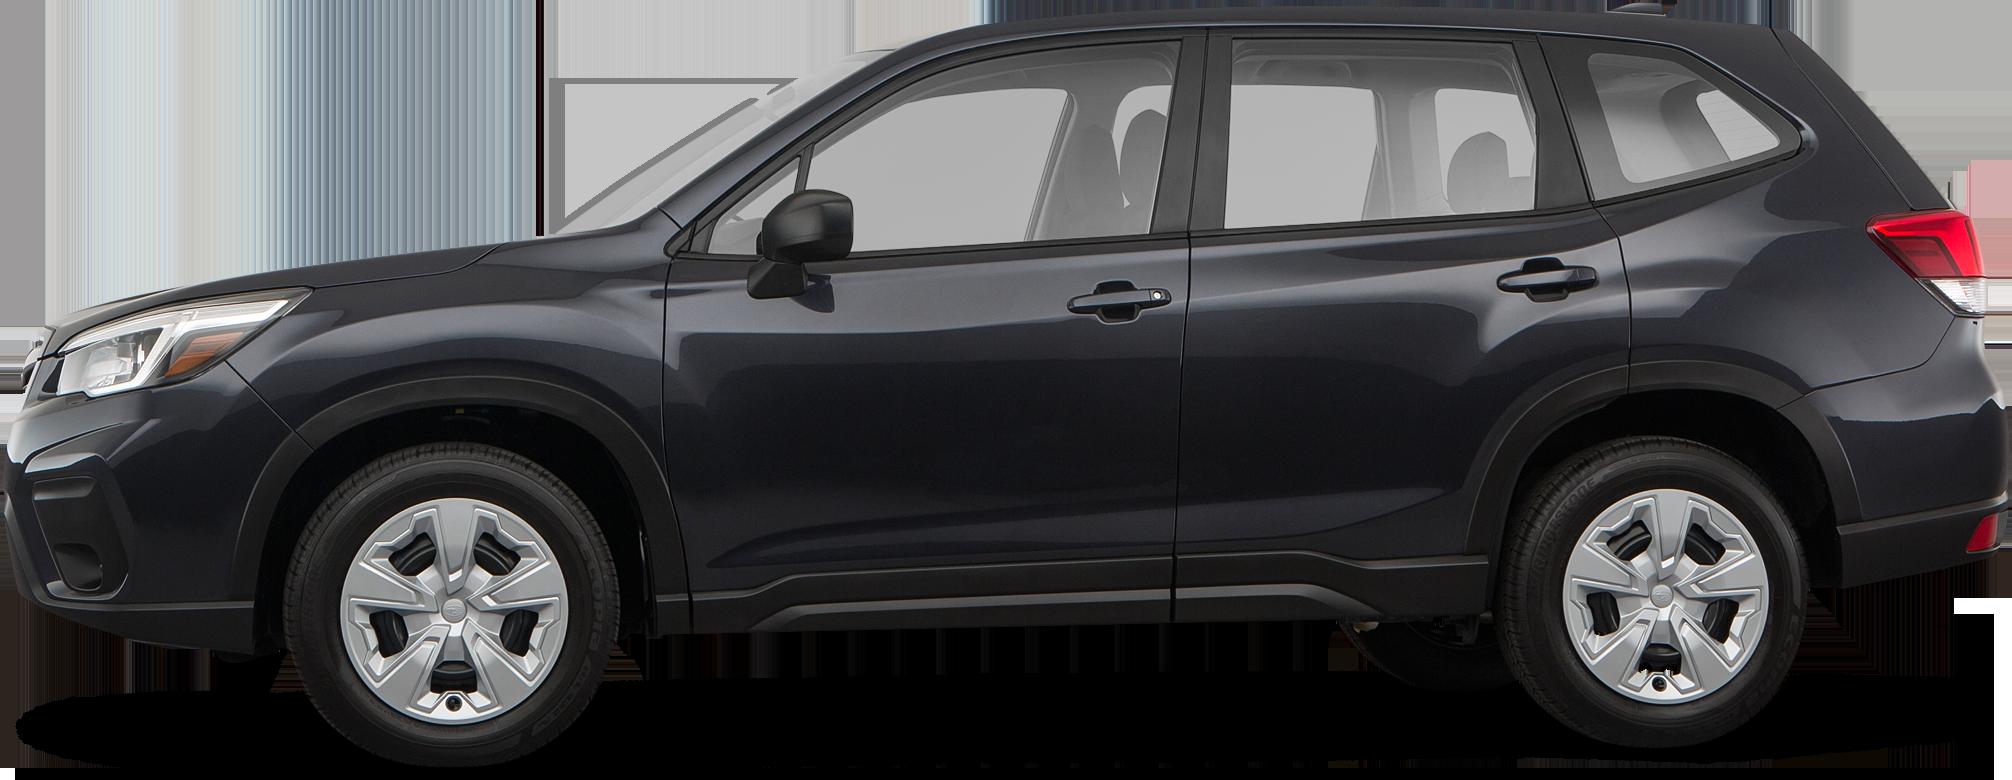 2019 Subaru Forester SUV Standard